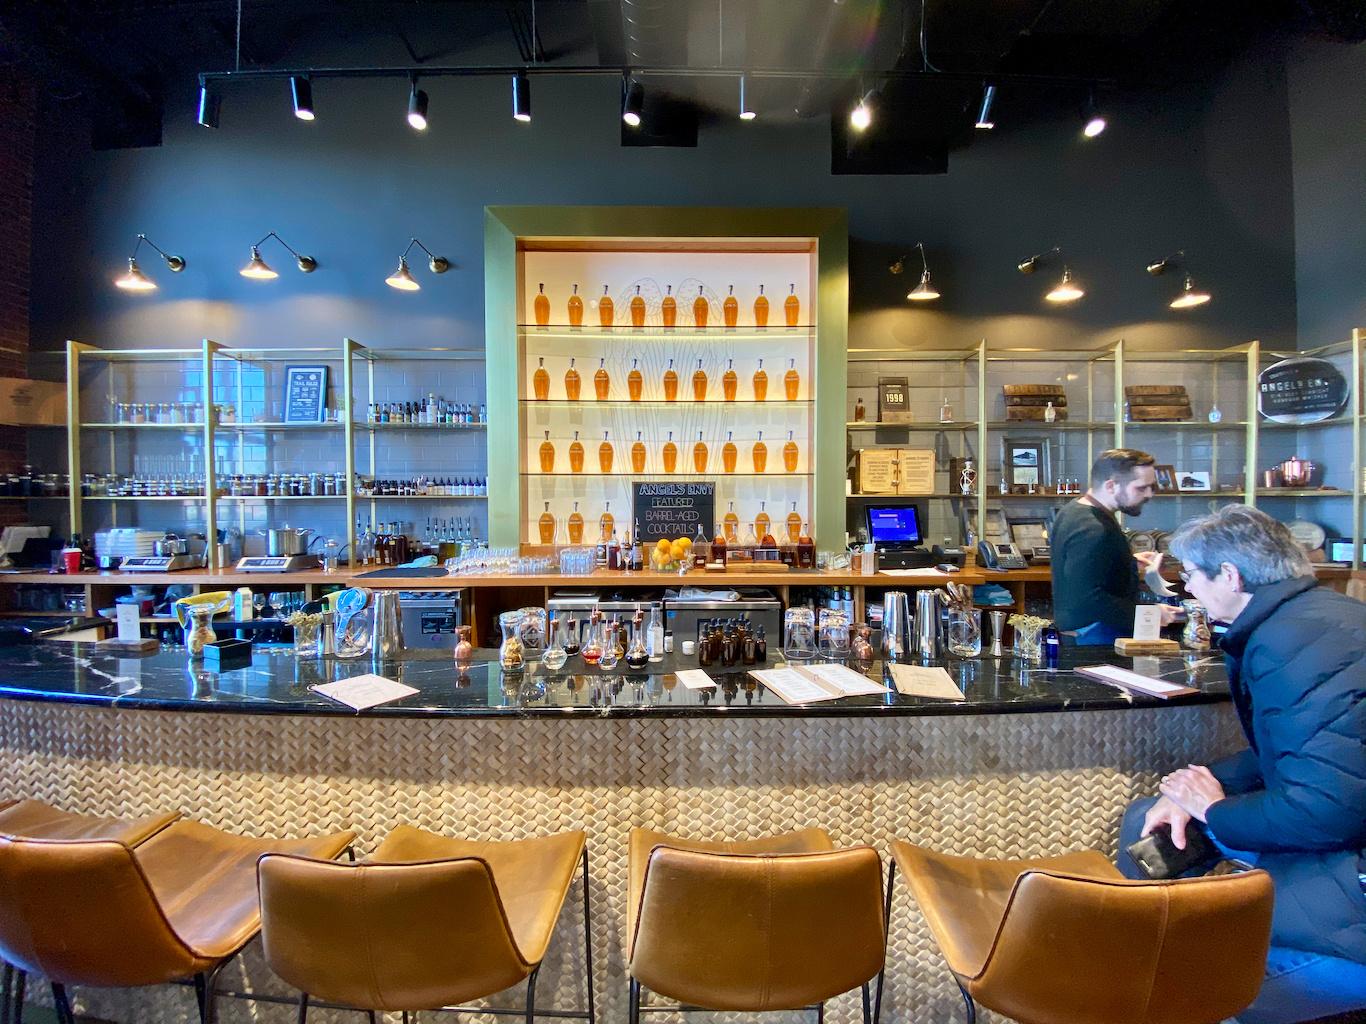 The Finishing Room Bar - Angel's Envy Distillery